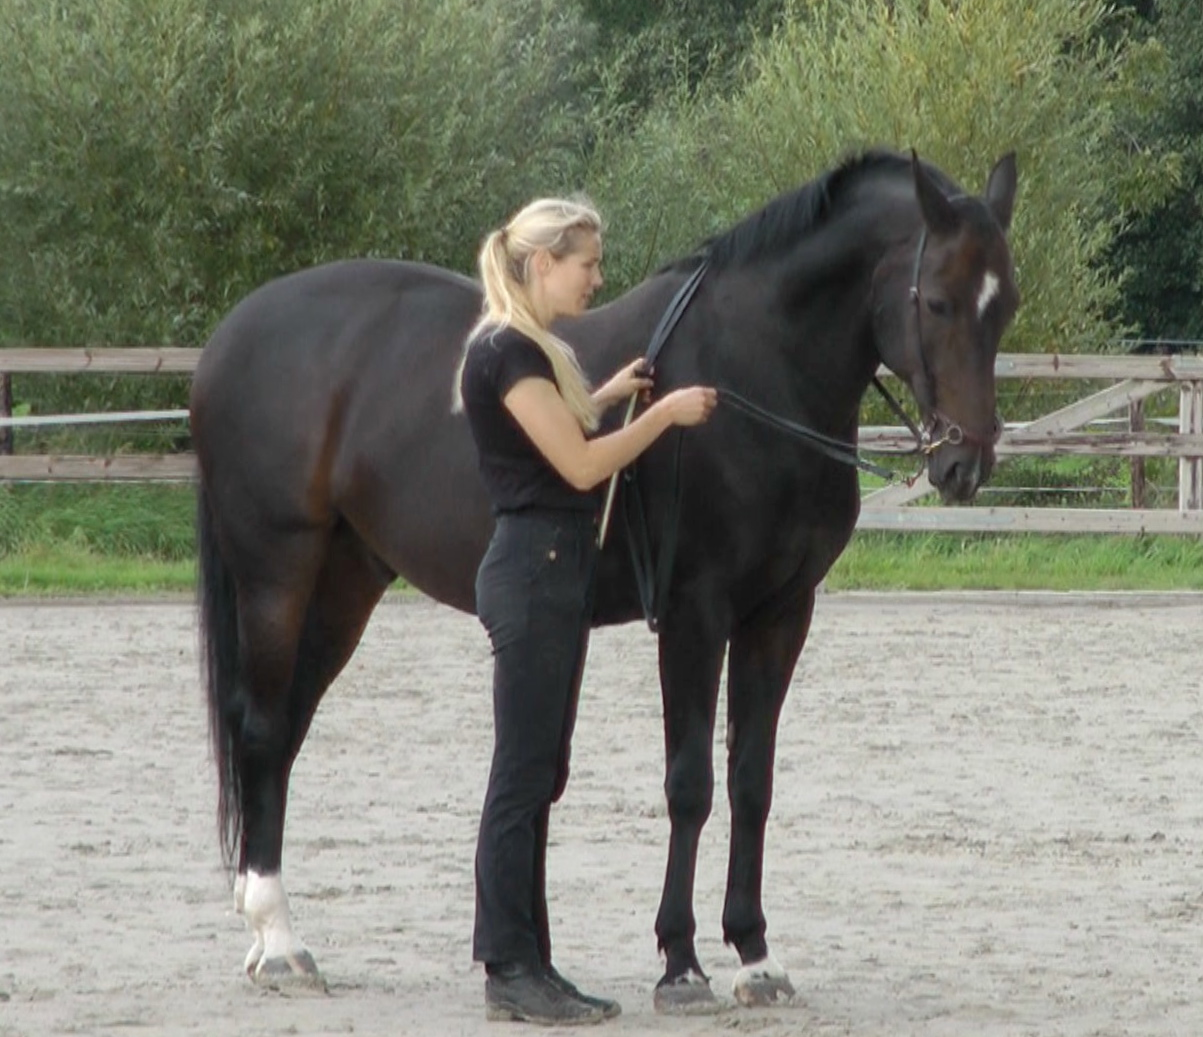 Clicker Training - Free Spirit Horse Training |Horse Training